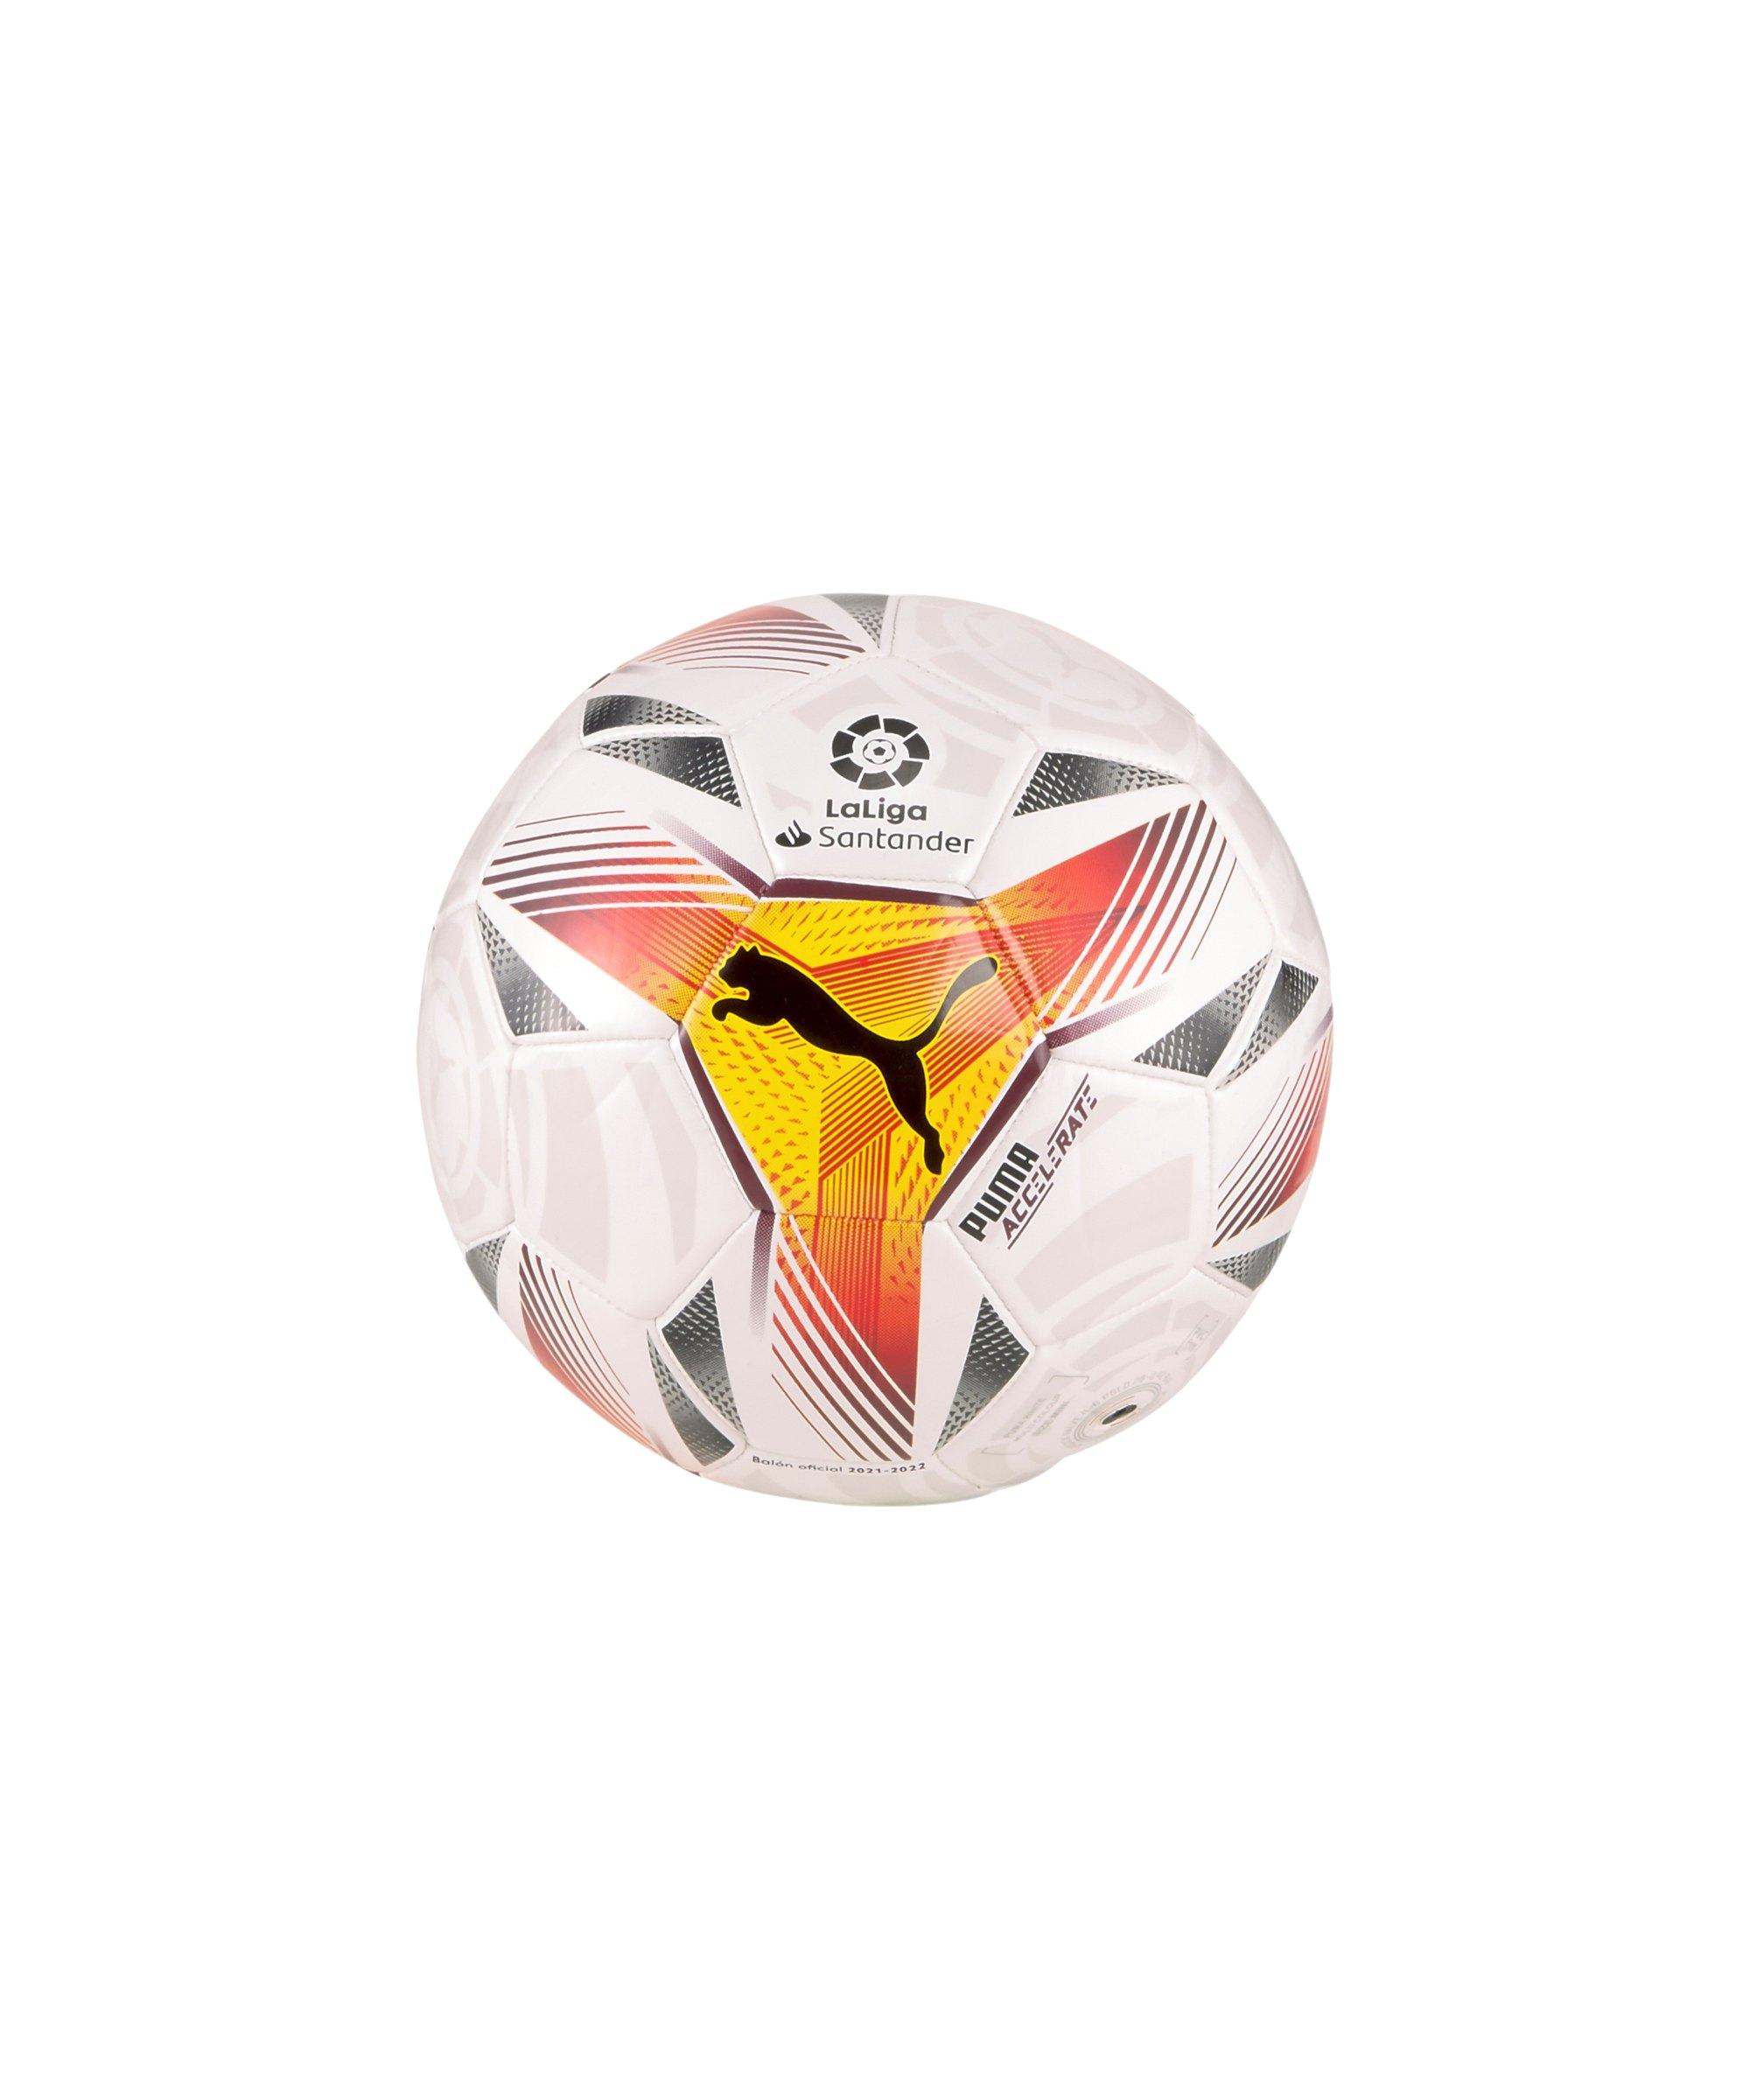 PUMA LaLiga 1 Accelerate Miniball Weiss F01 - weiss